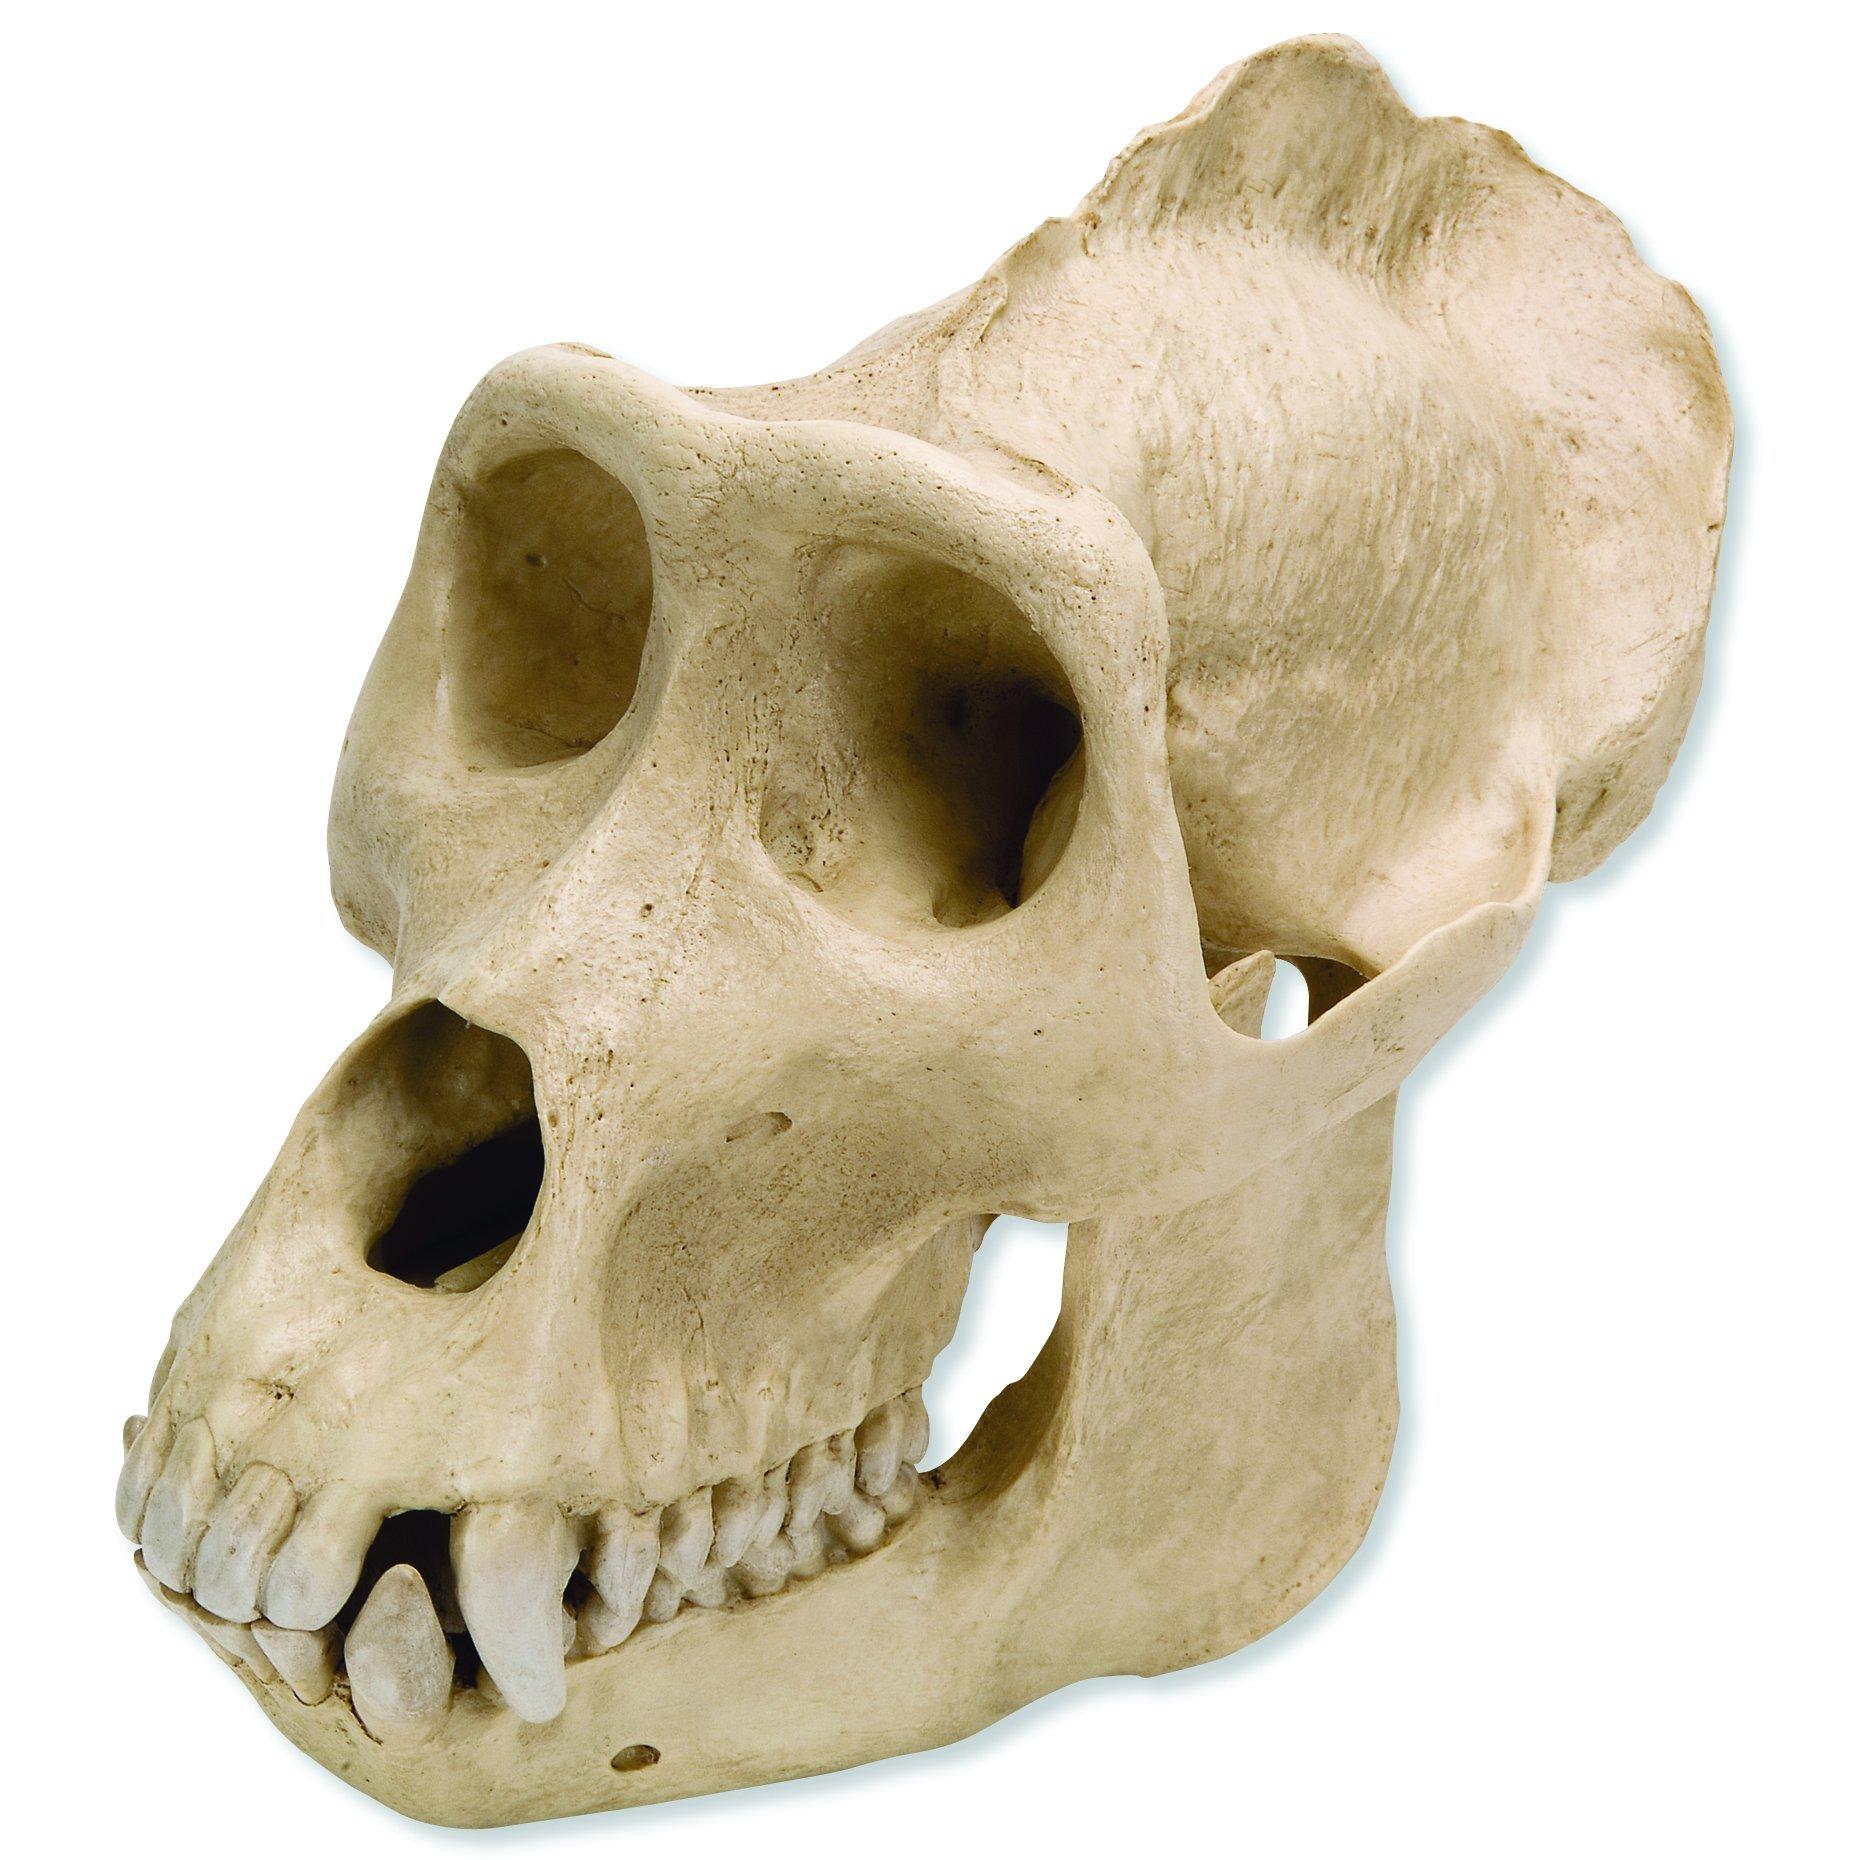 3B Scientific VP762/1 Plastic Male Gorilla Skull (Gorilla gorilla), 10.2'' x 6.5'' x 7.7''